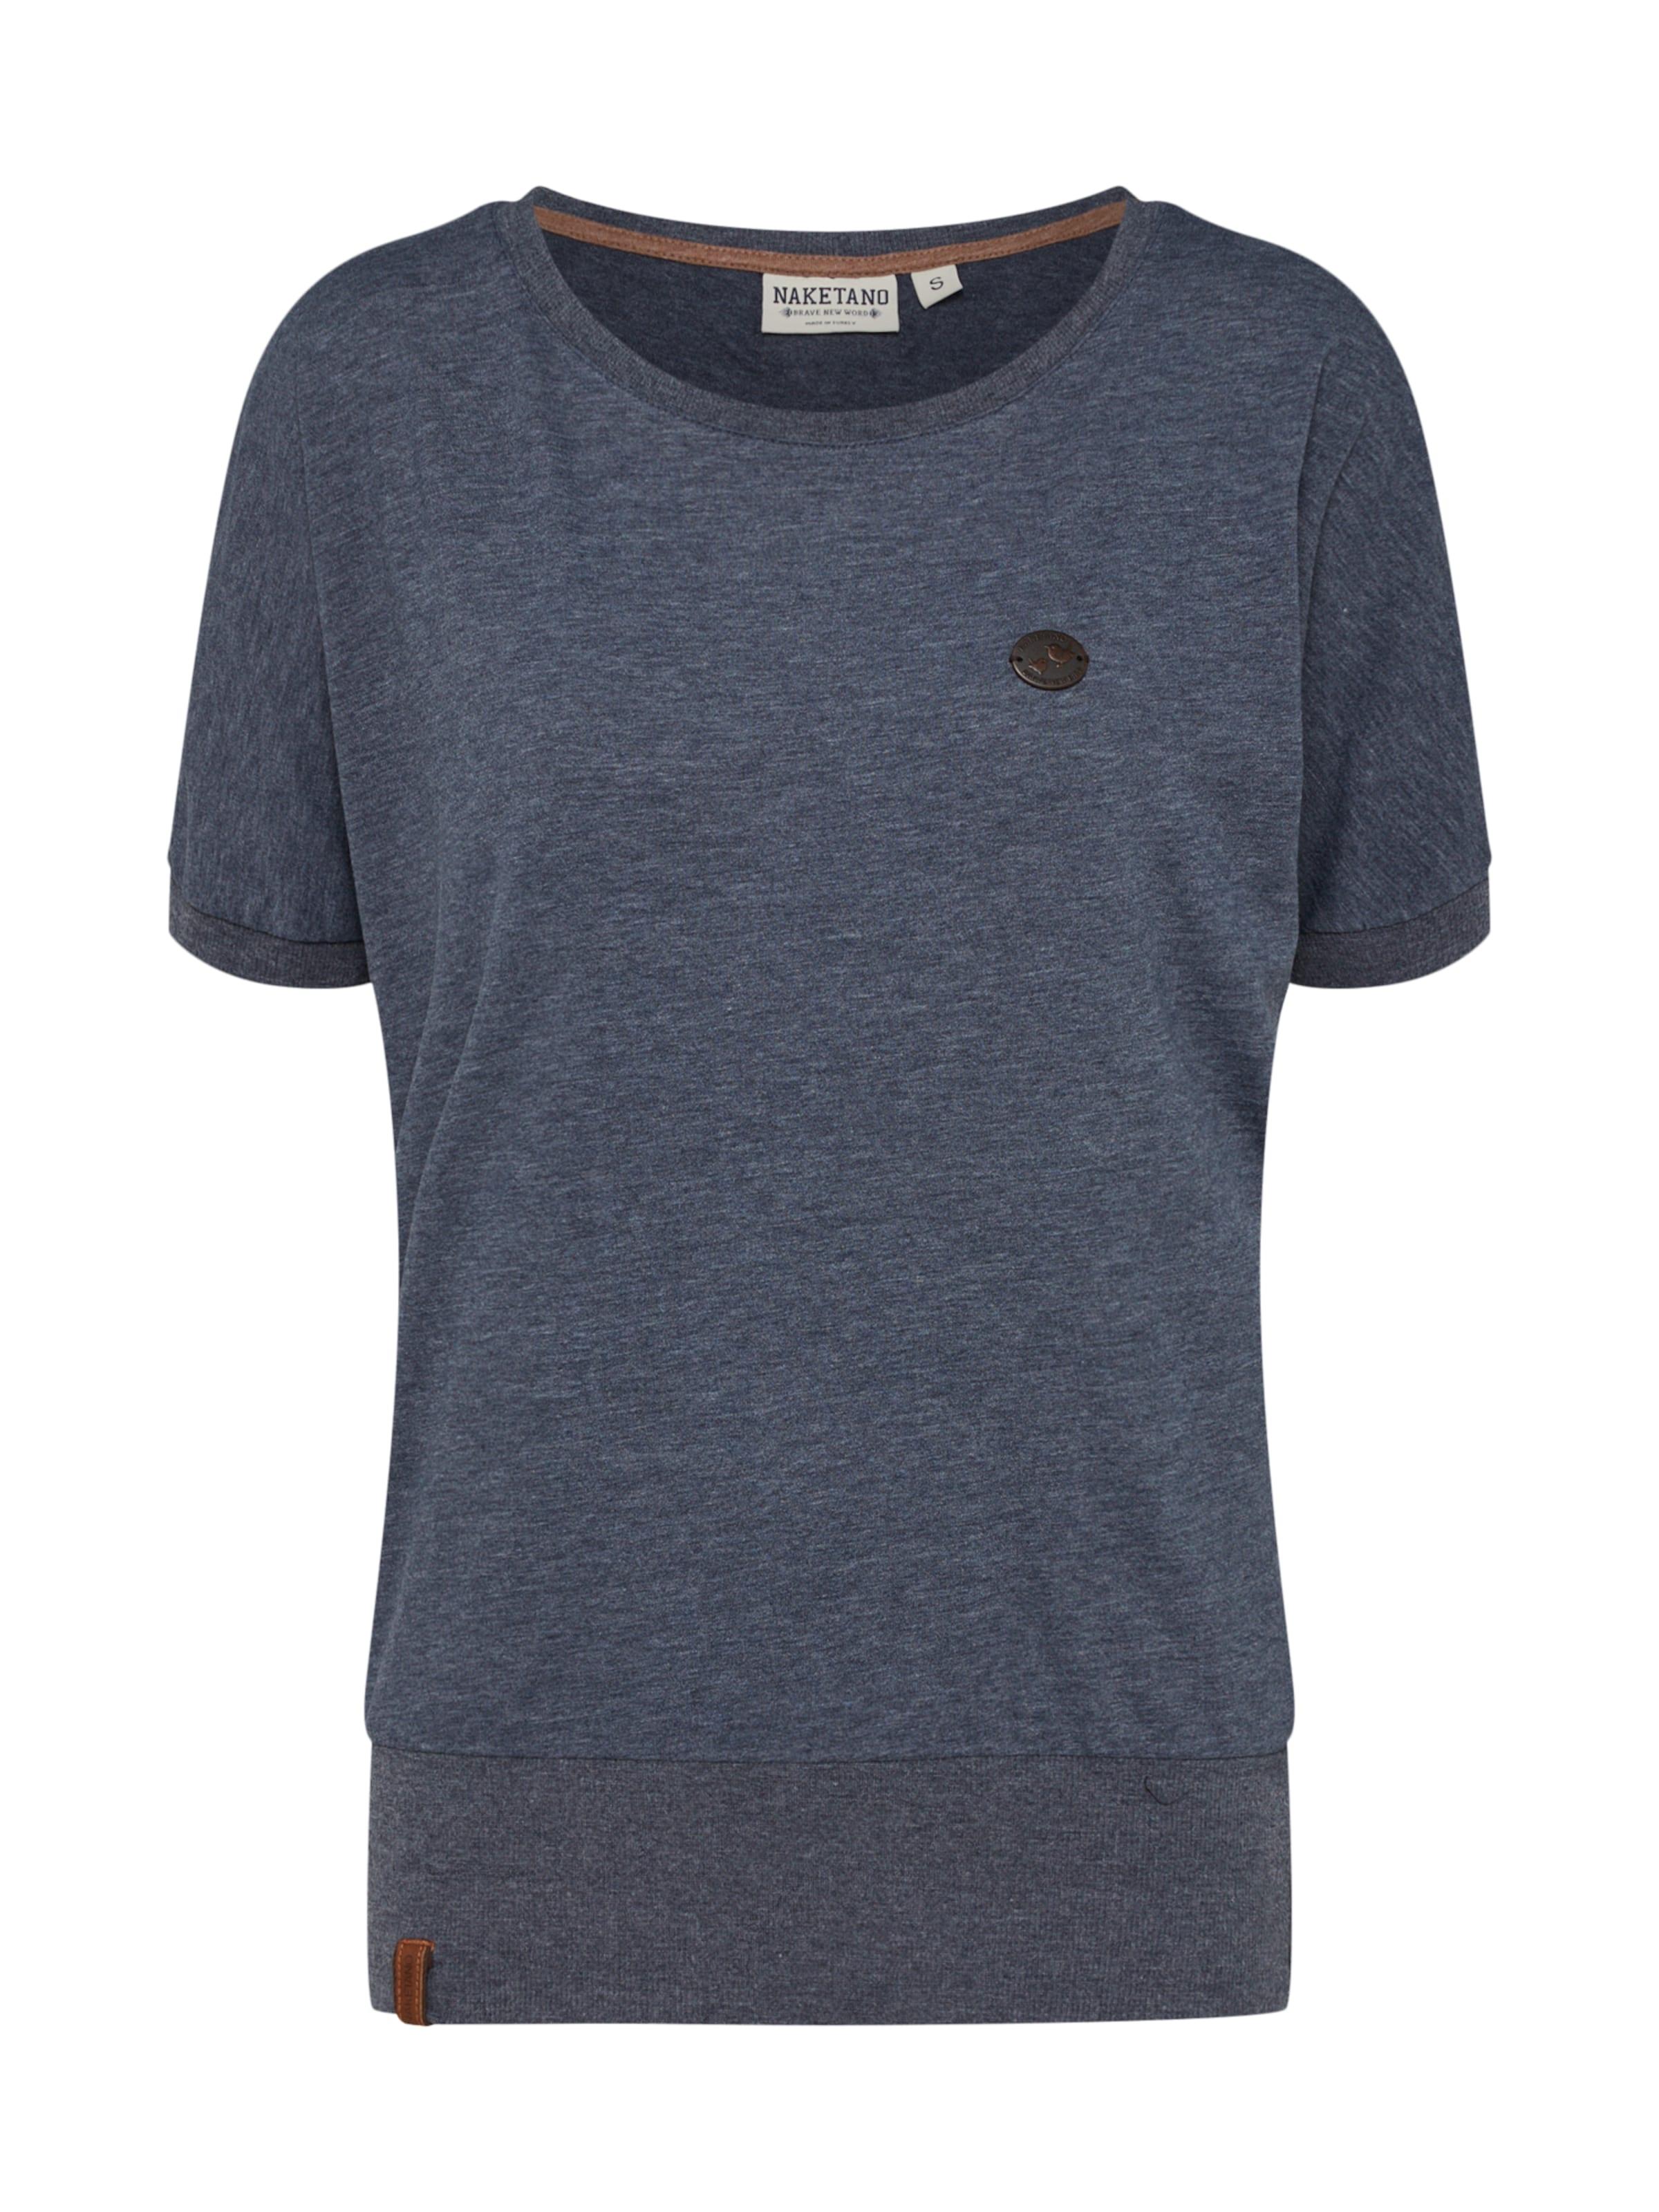 Shirt Wit It' In Indigo Naketano 'baunxxx PkZiTuOX